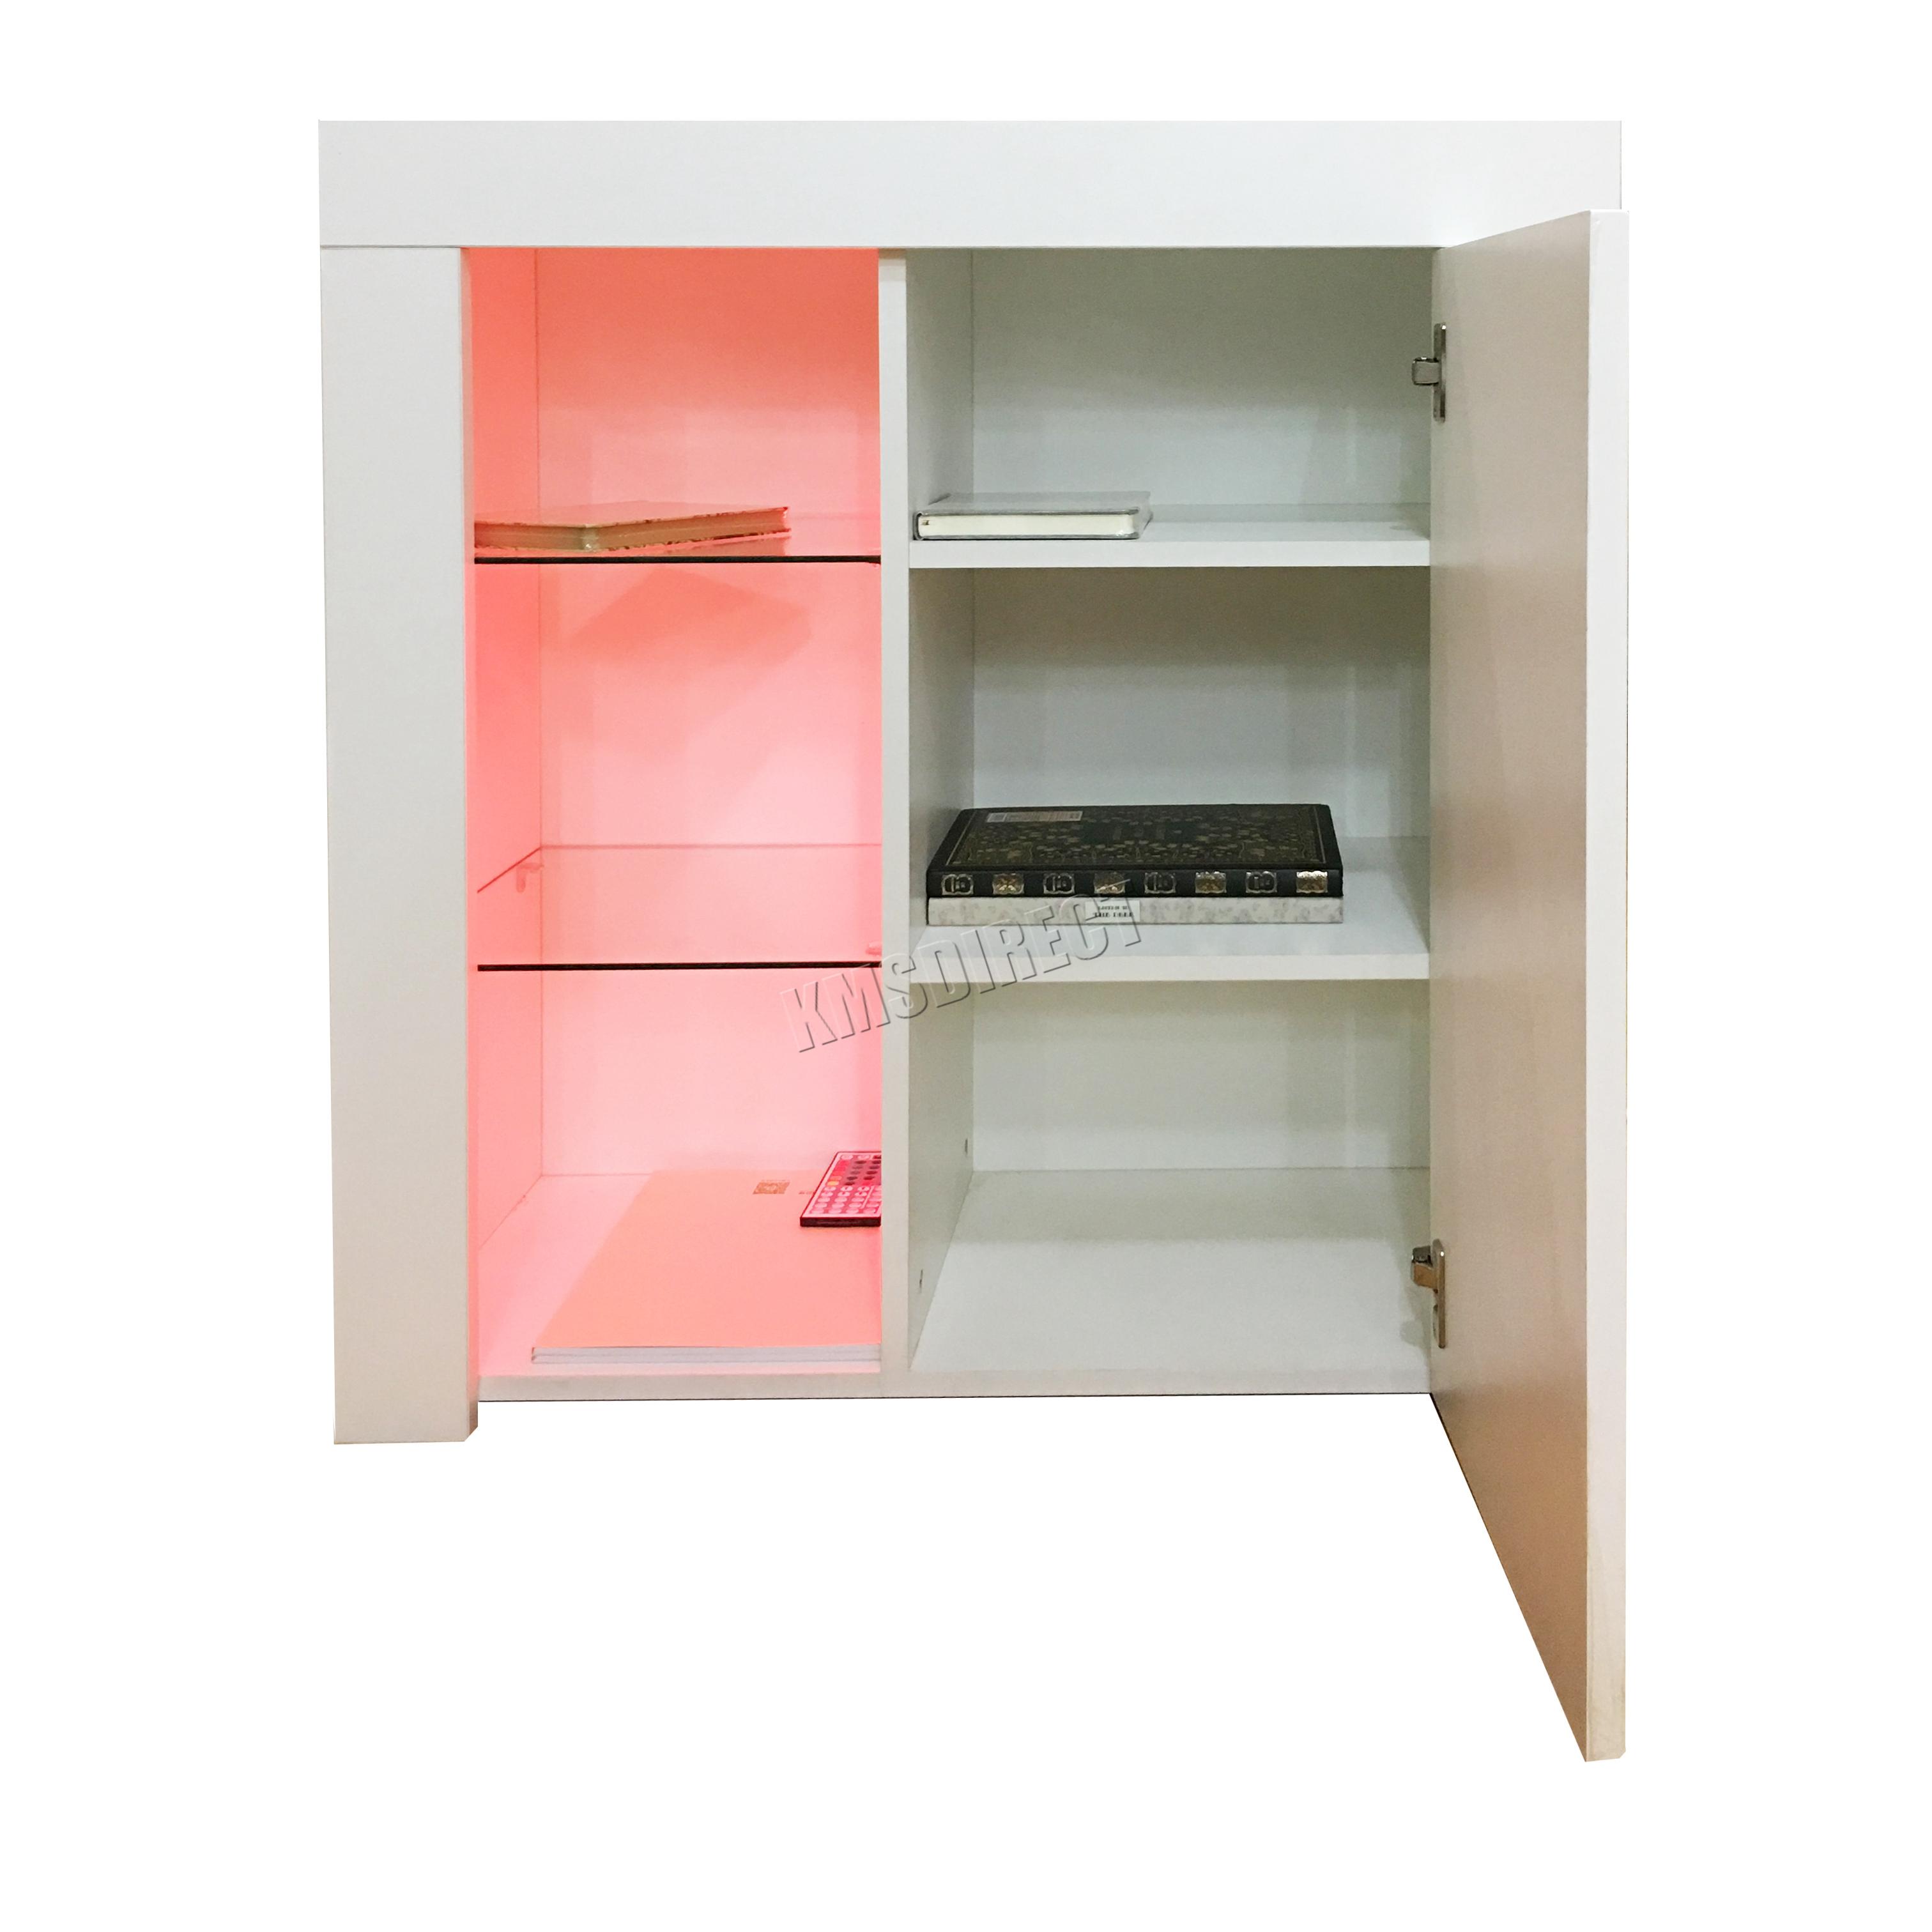 foxhunter high gloss matt cabinet sideboard cupboard pb remote control led phc01 ebay. Black Bedroom Furniture Sets. Home Design Ideas